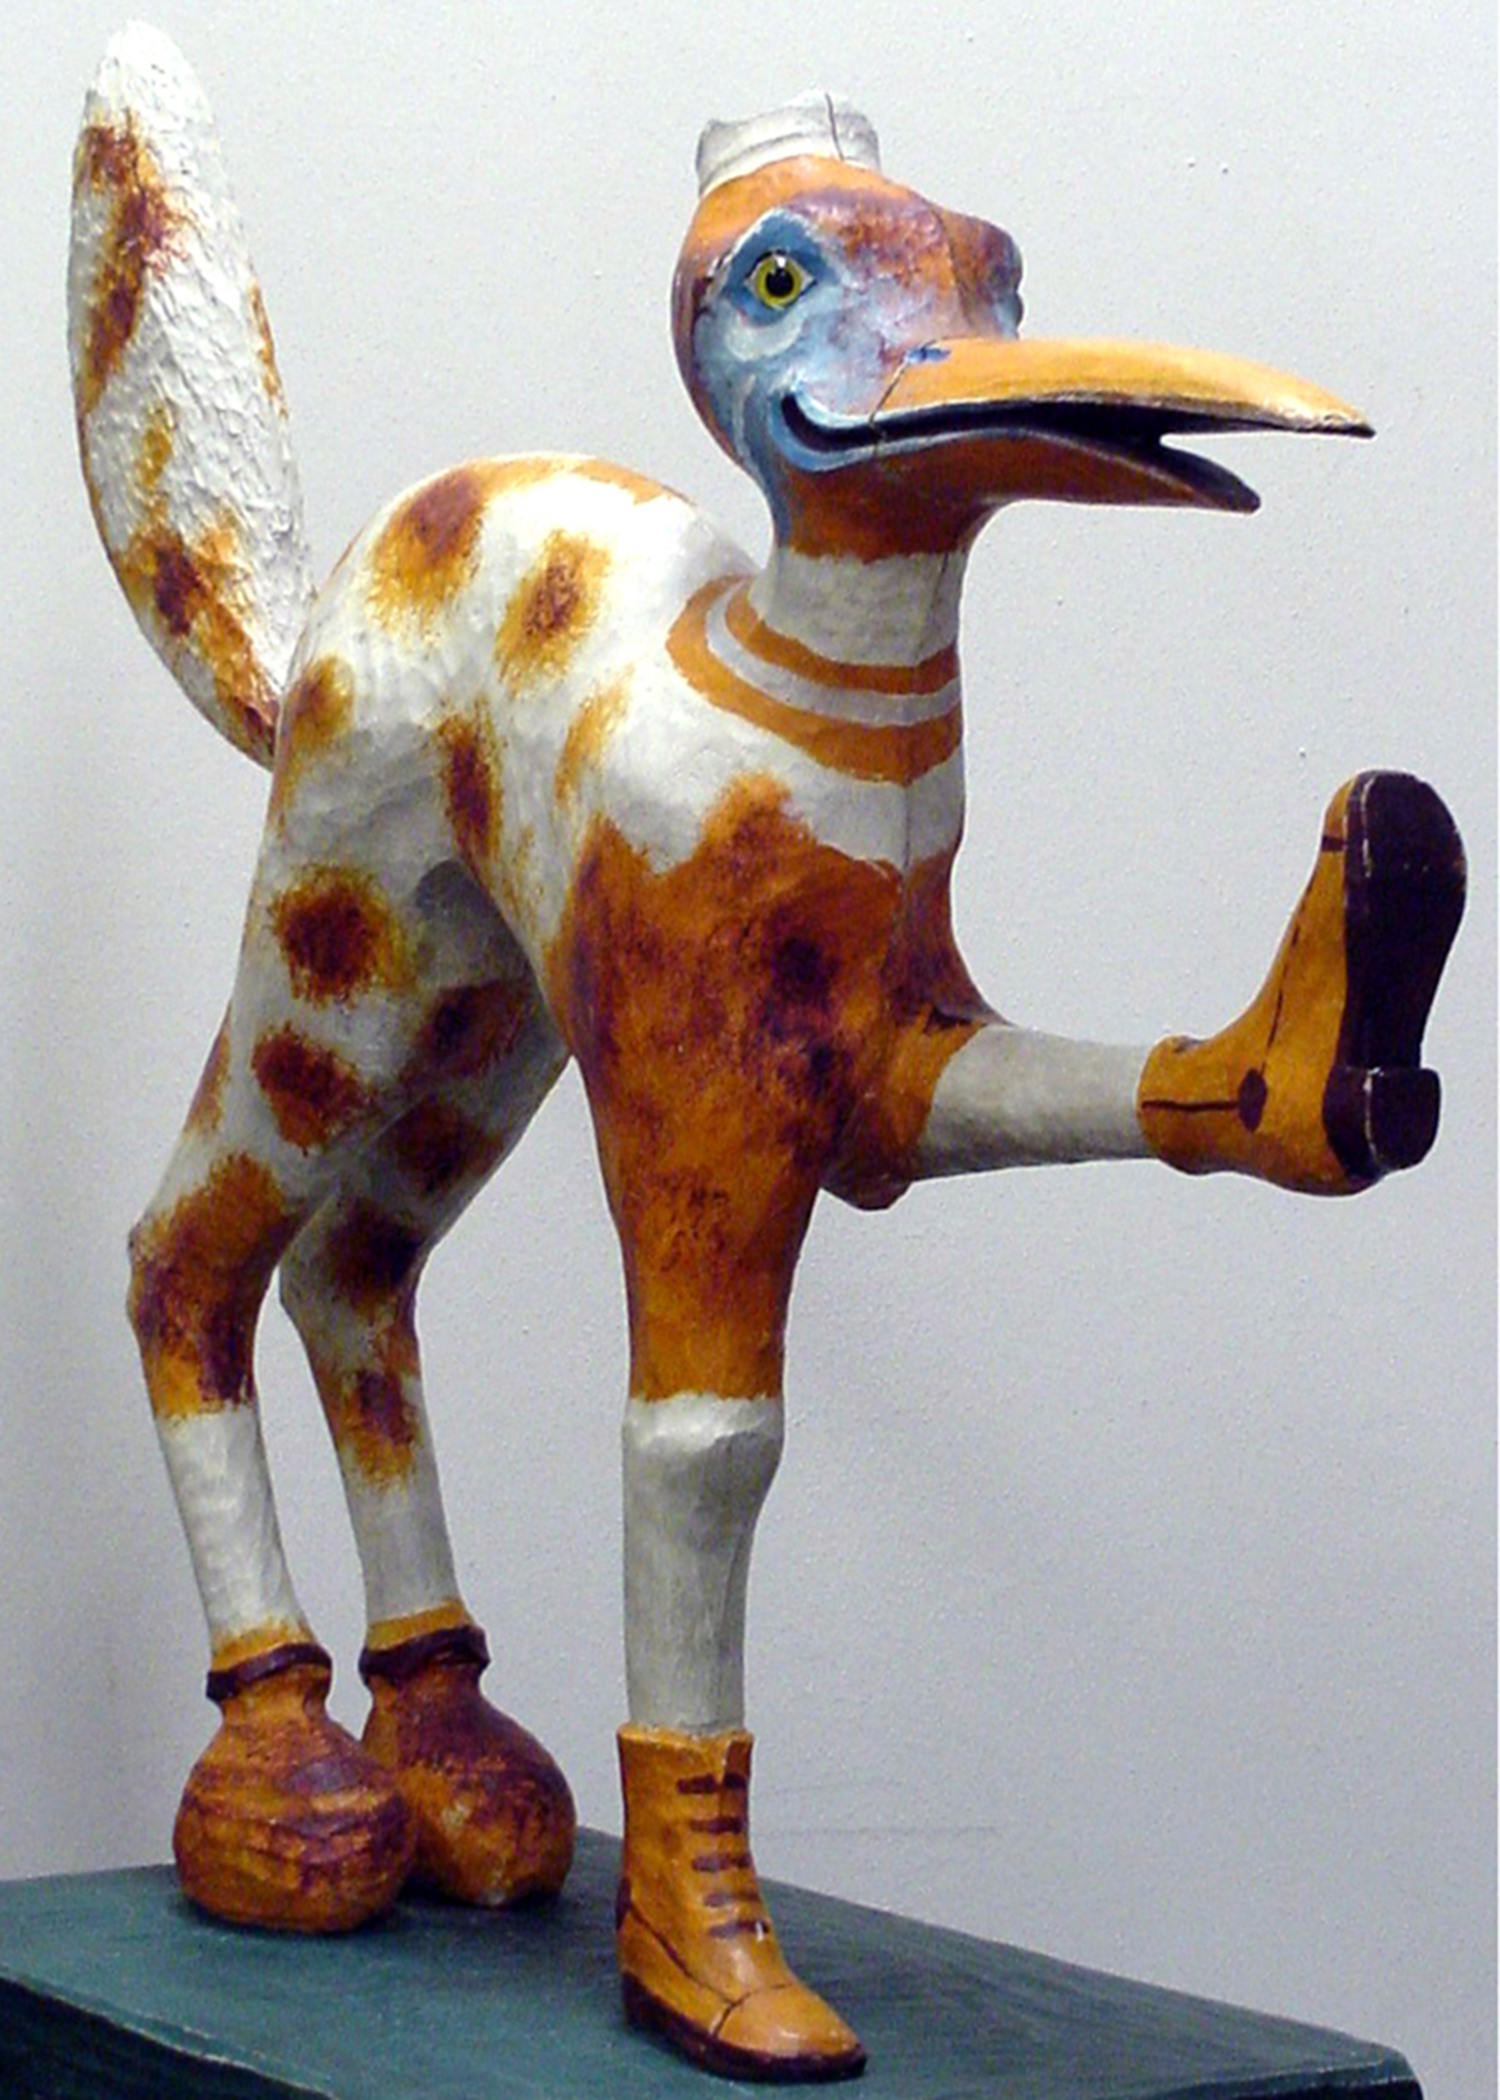 Peregrinus, law school mascot